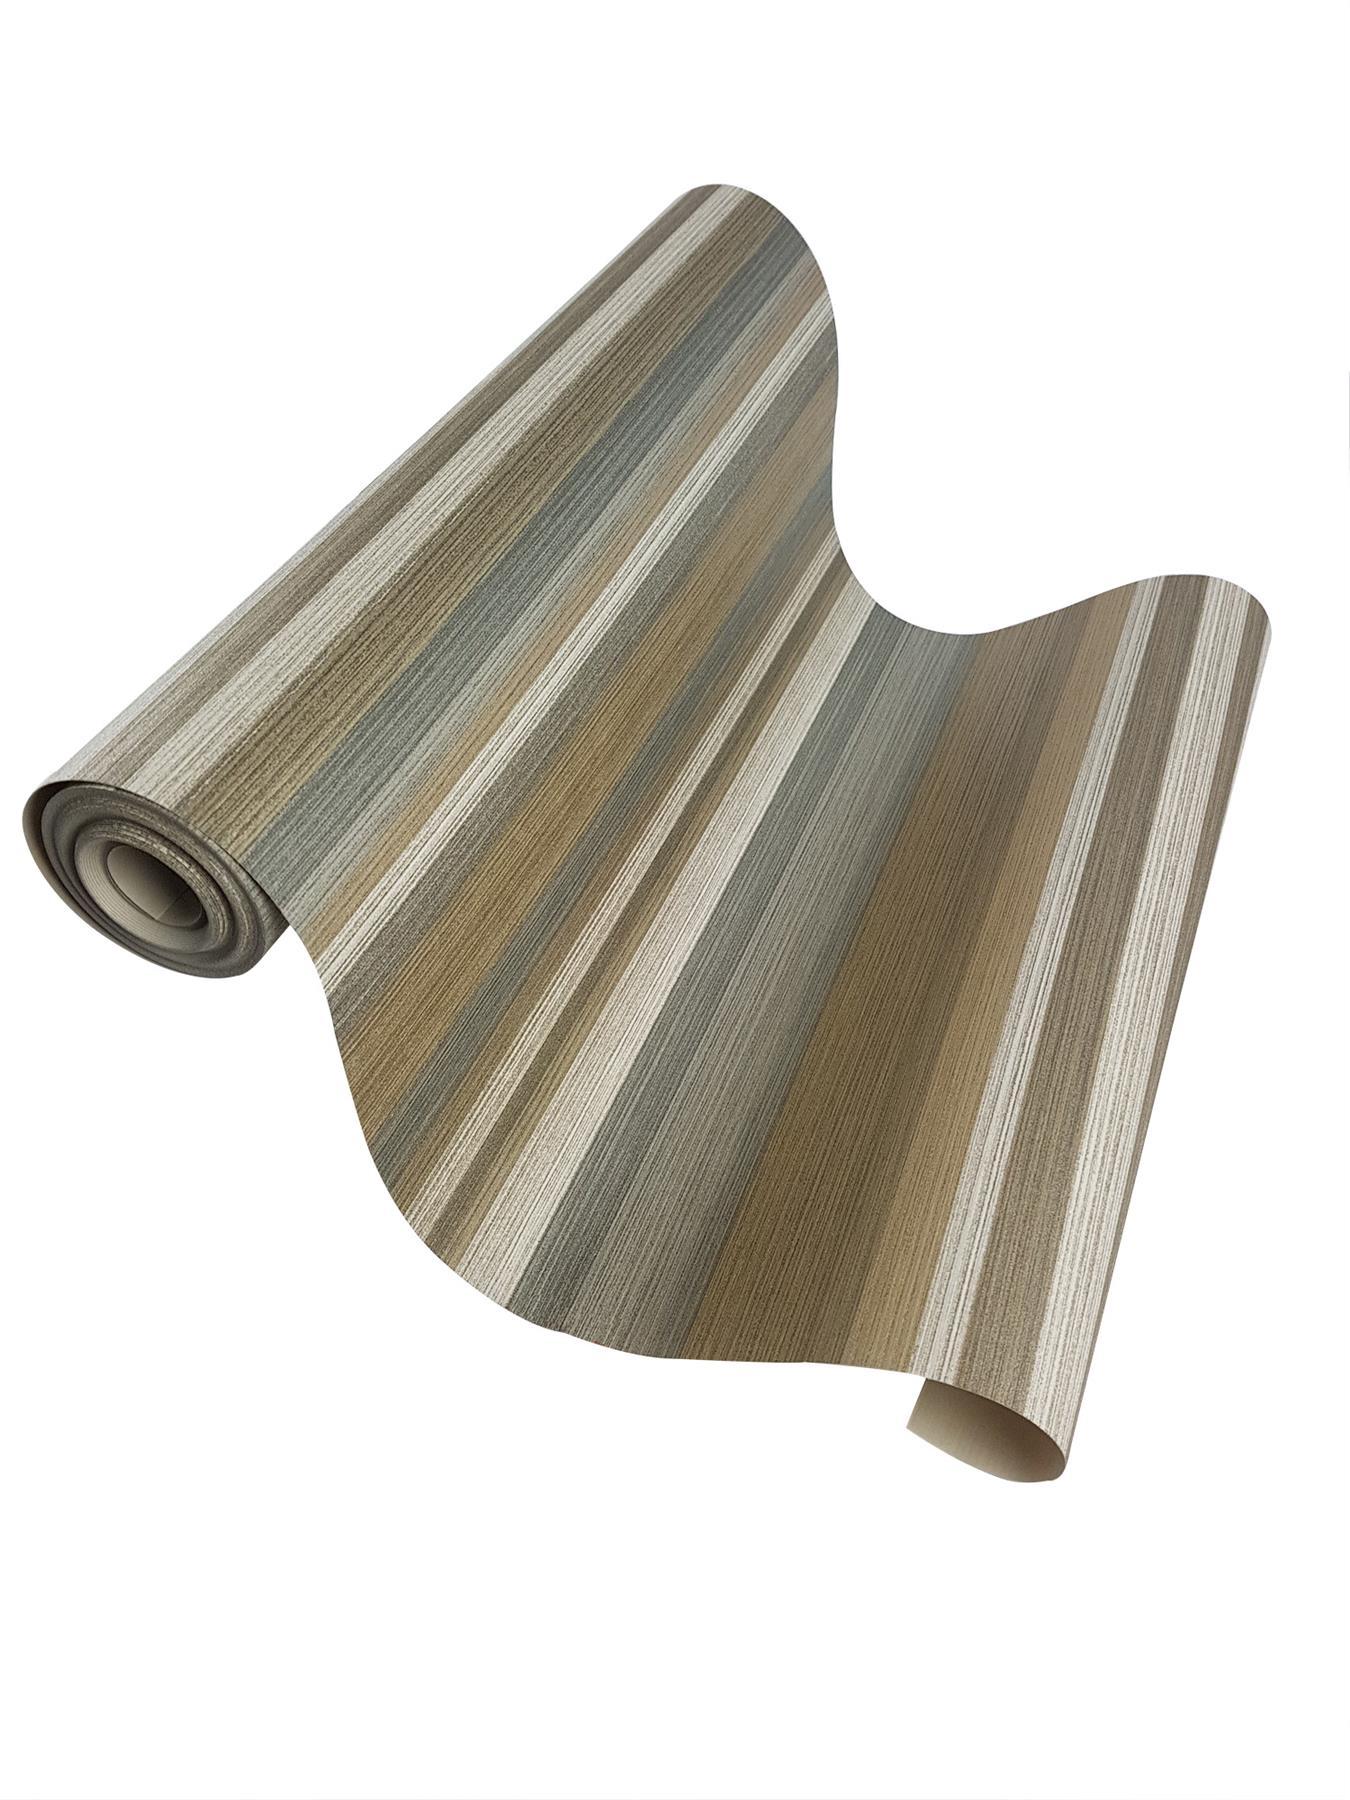 Green Gold Beige Silver Striped Wallpaper Metallic Shimmer Vinyl Stripes Crown